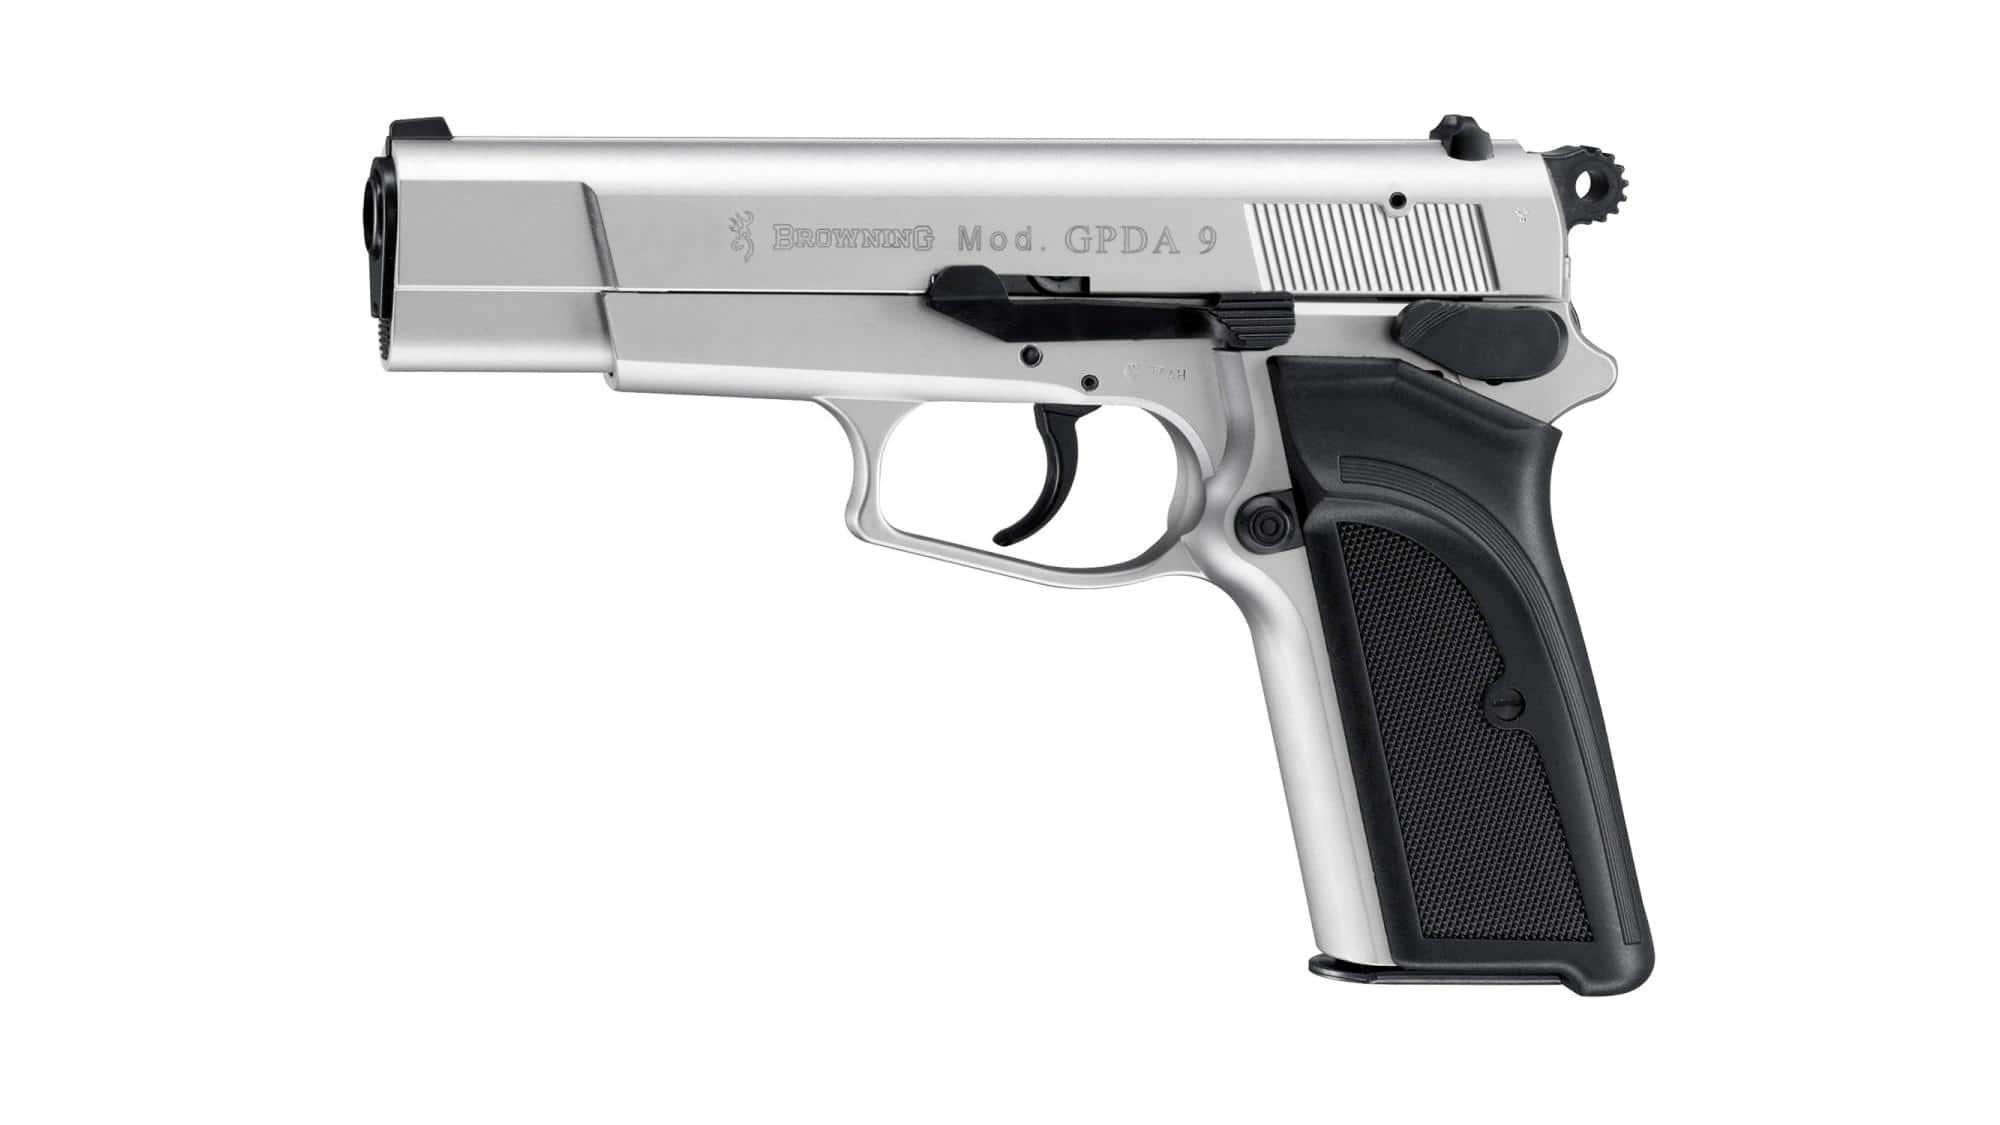 Gun 9 mm white Browning GPDA silver